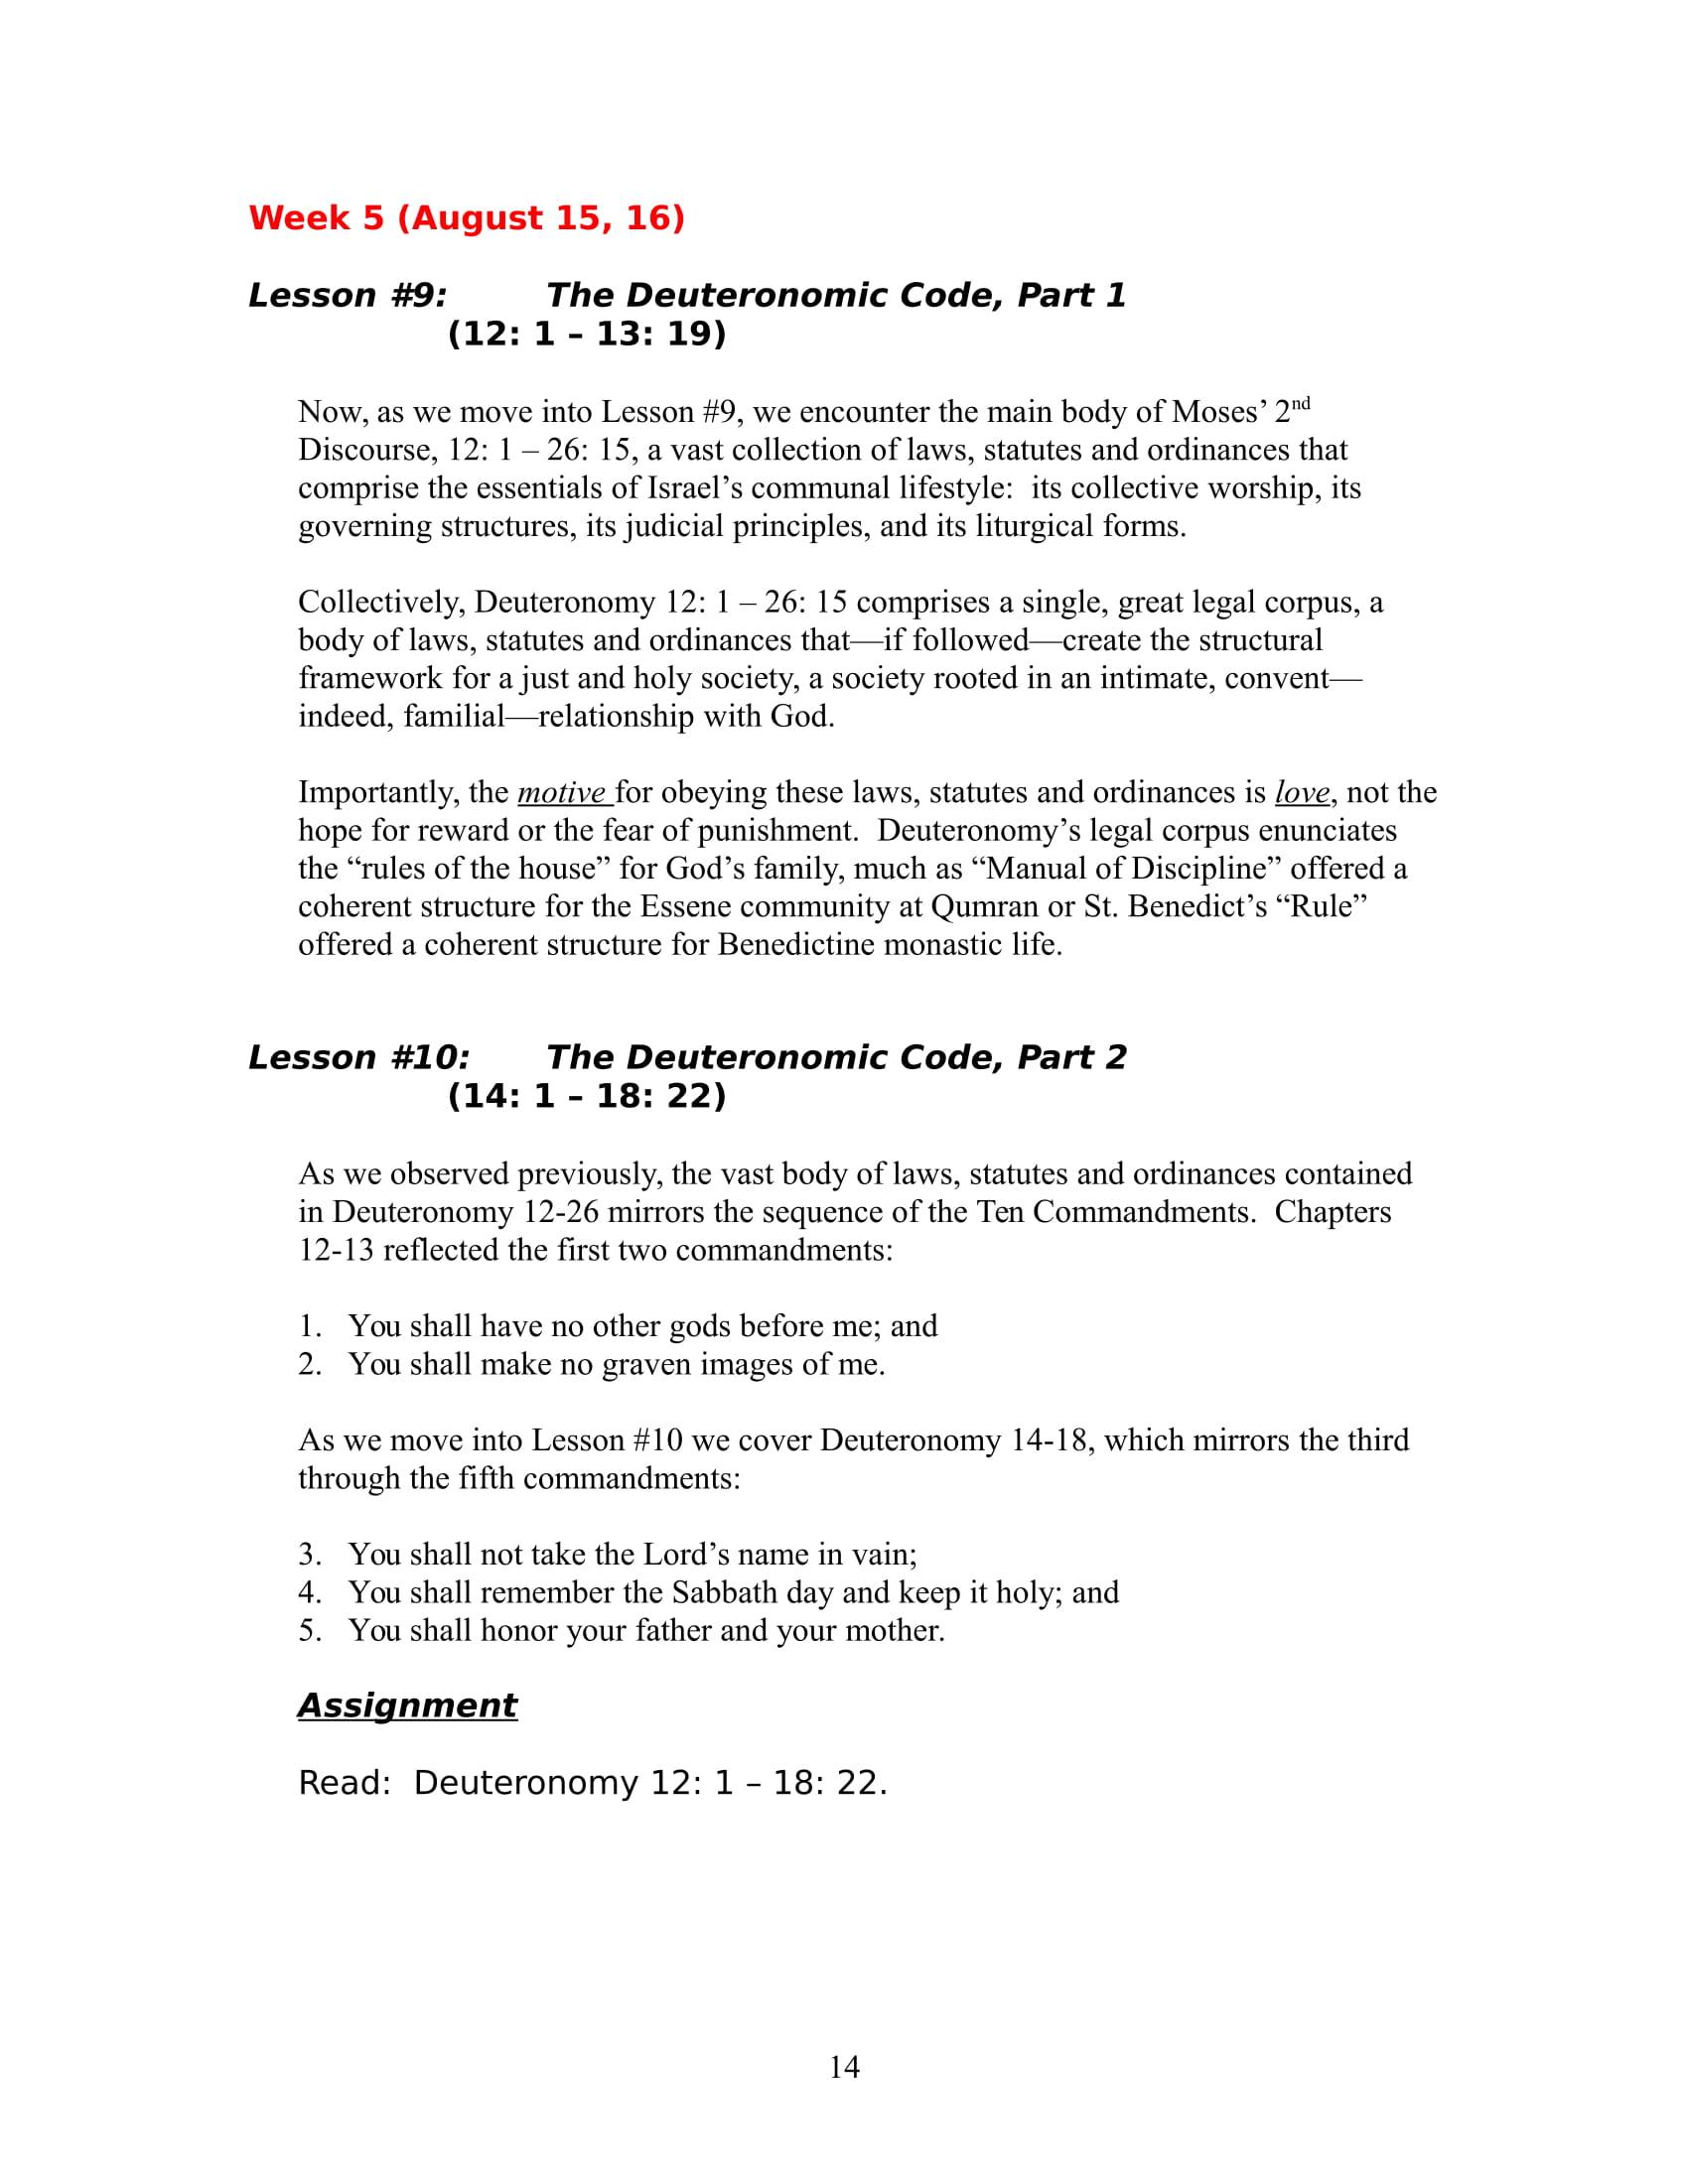 Deuteronomy Syllabus-14.jpg